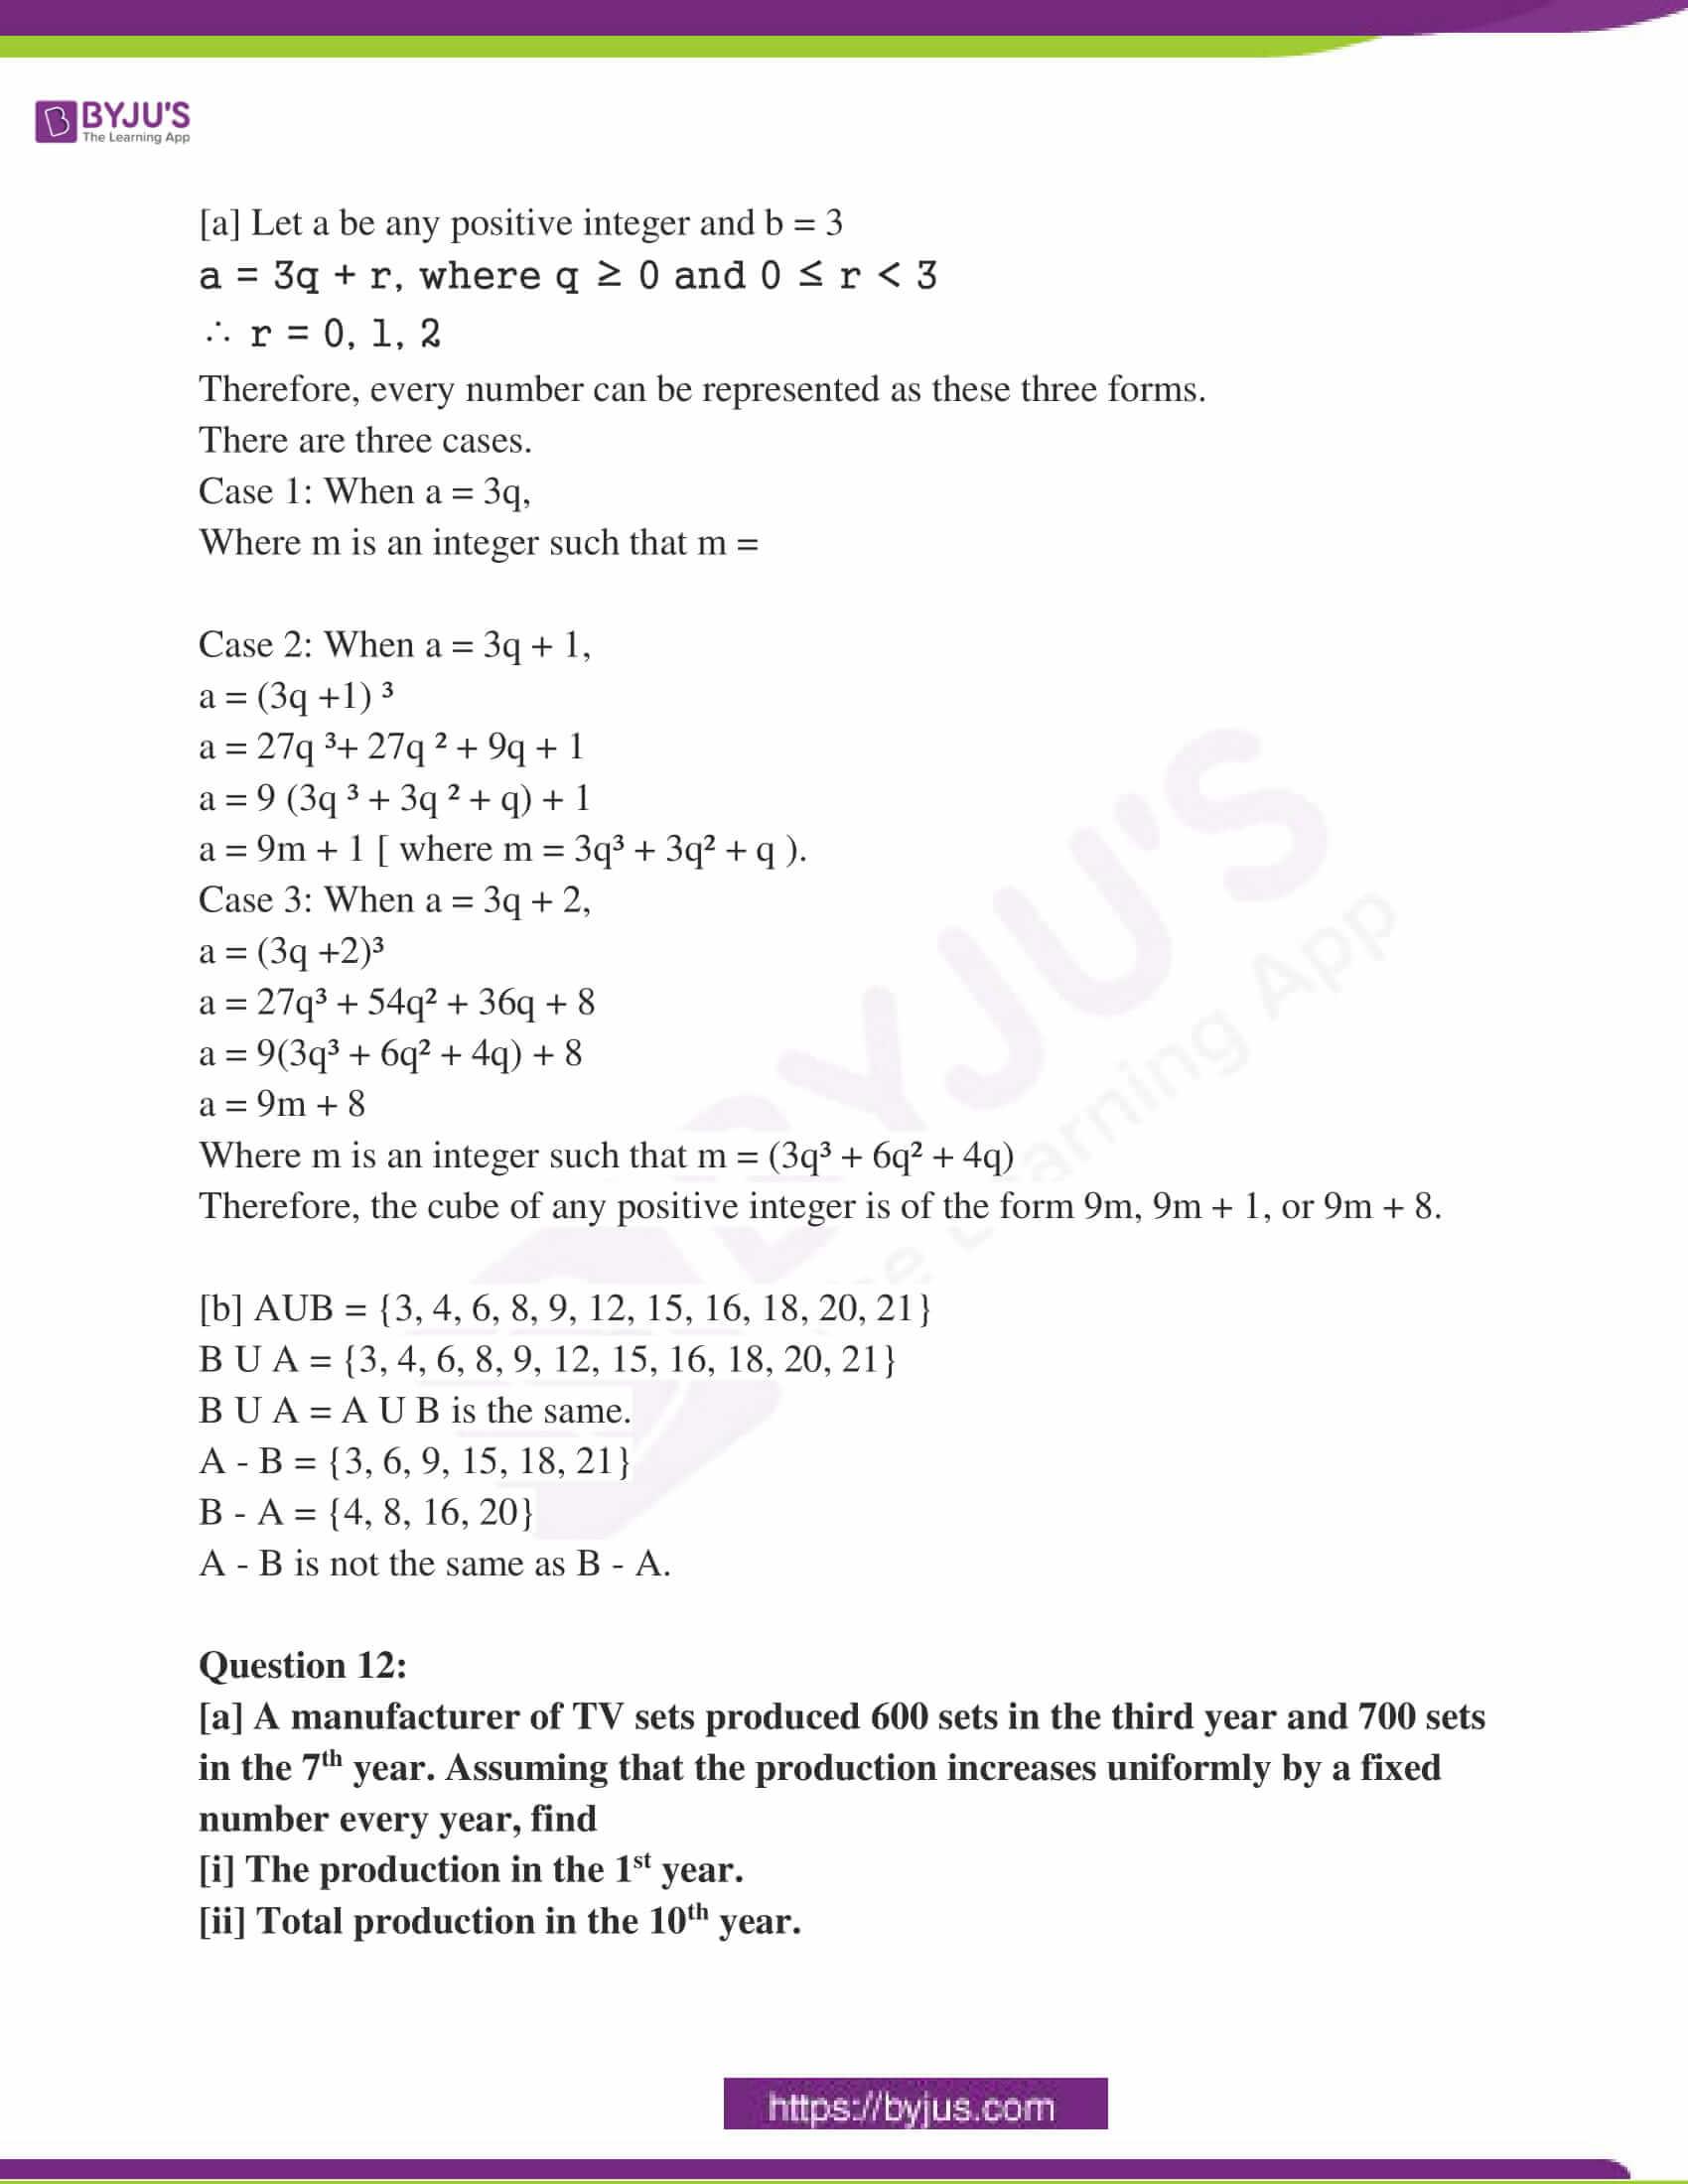 ap class 10 maths question paper 1 sol march 2017 07